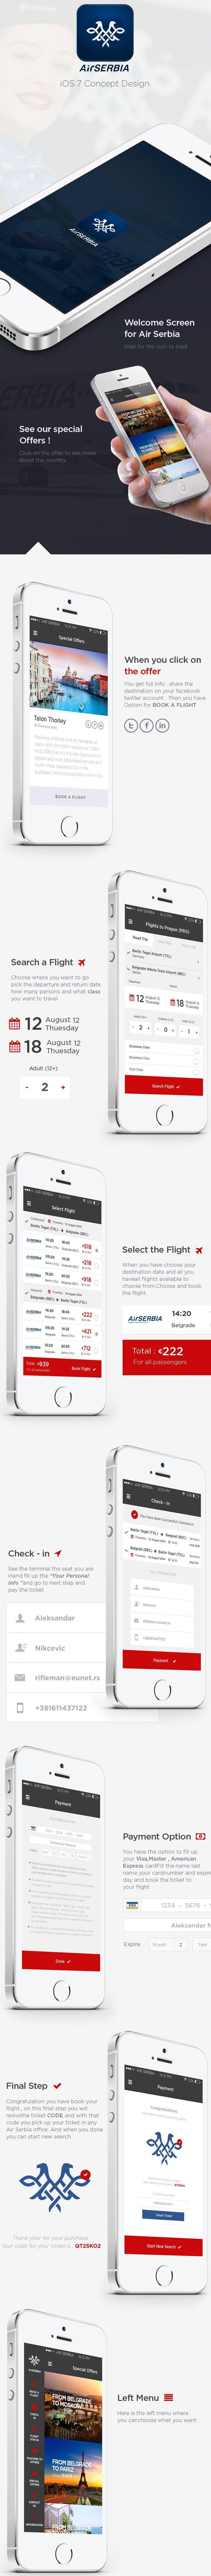 Air Serbia Flight Search App: